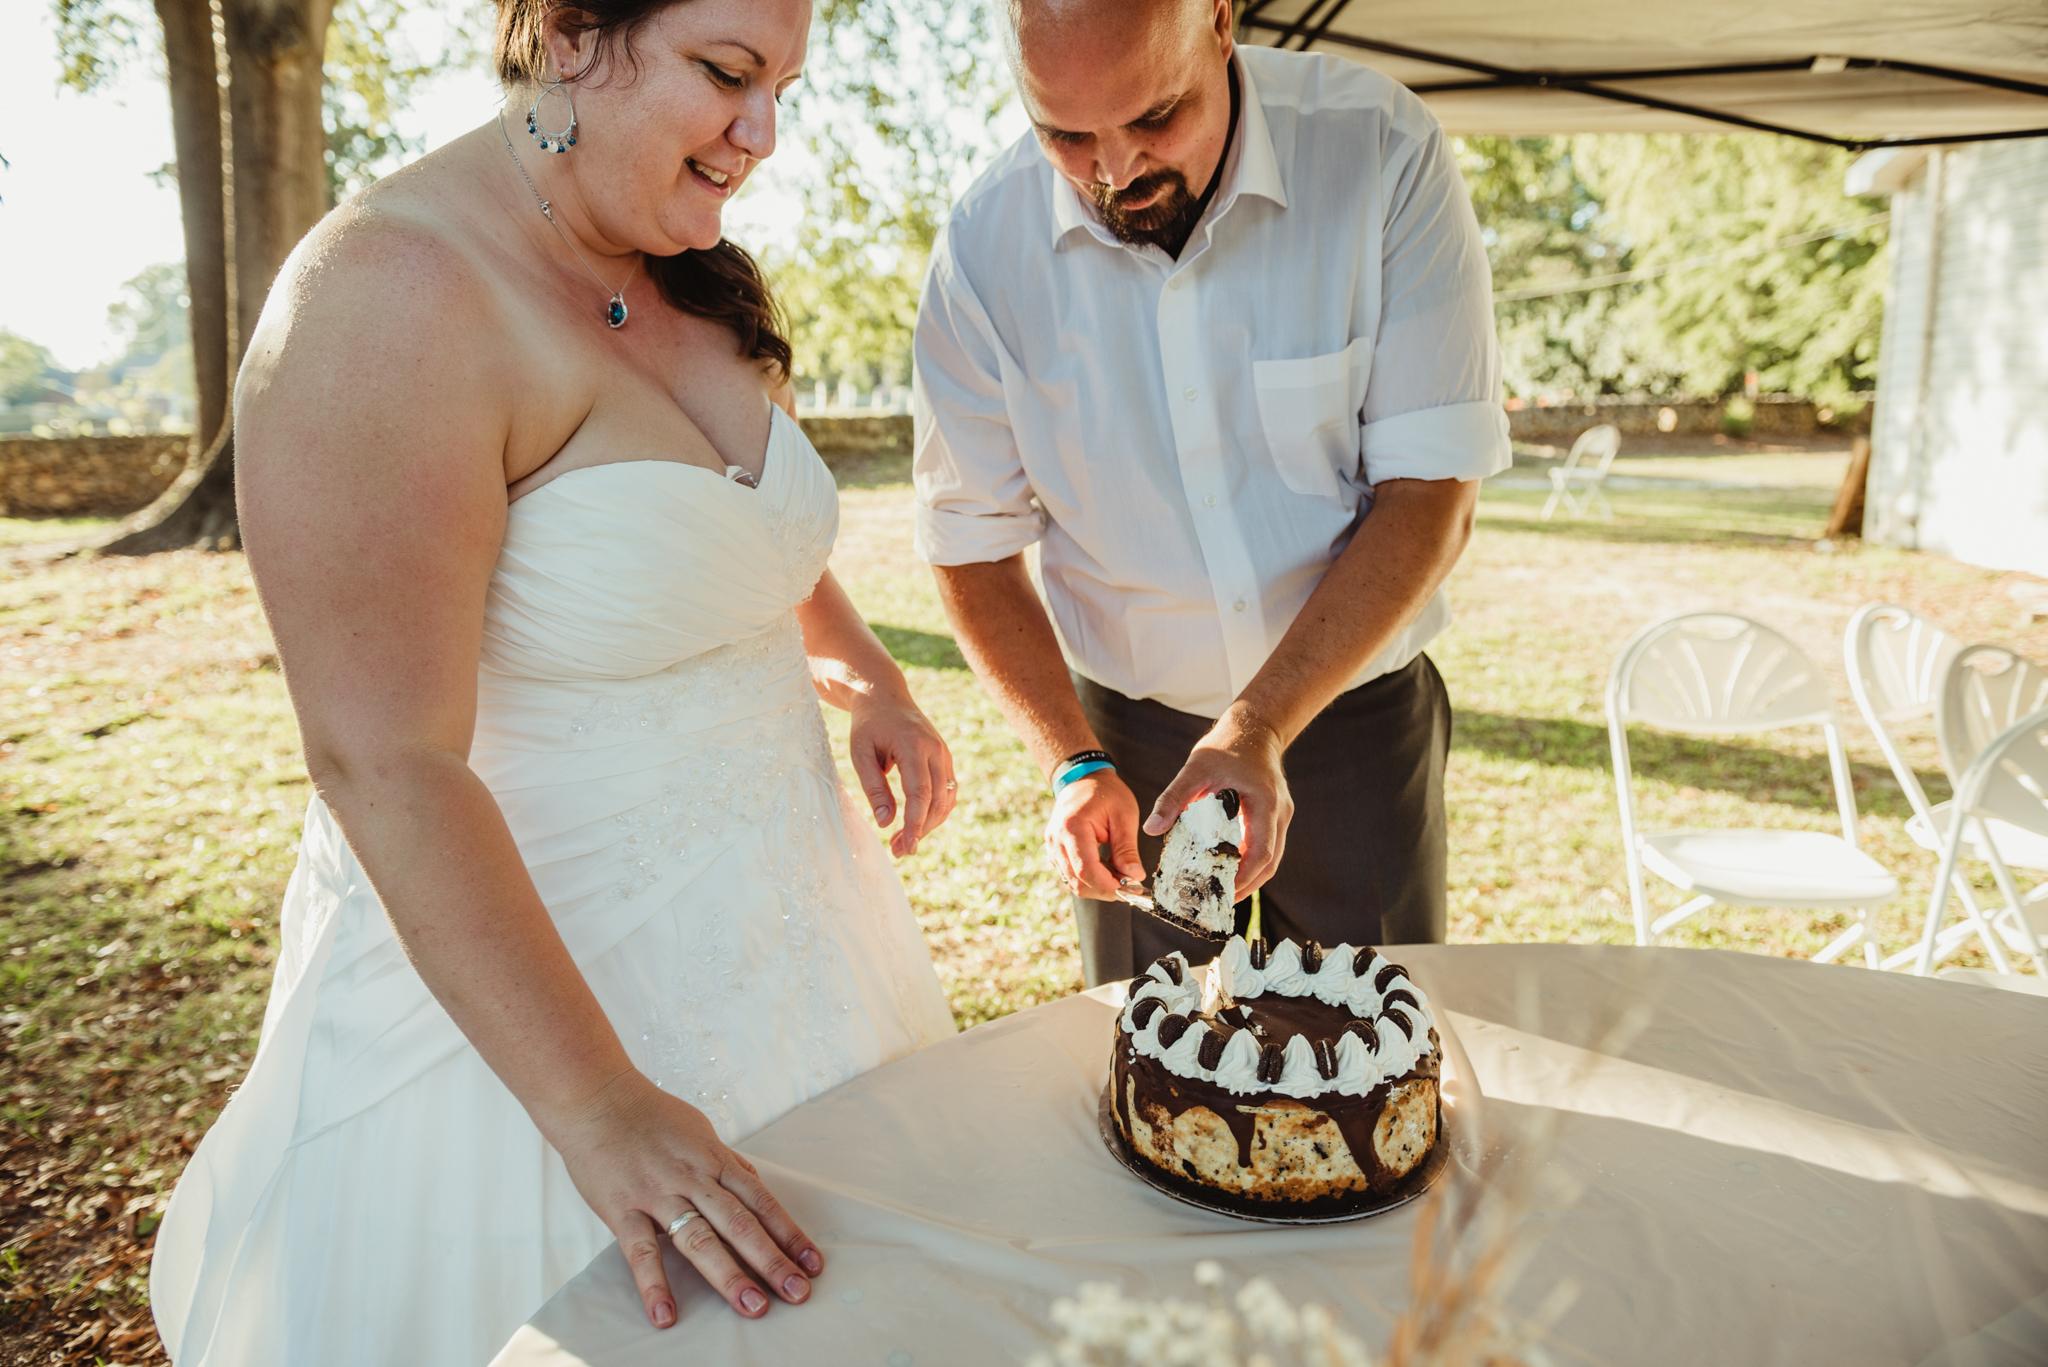 raleigh-wedding-outdoor-reception-cake-cutting-cd-1.jpg